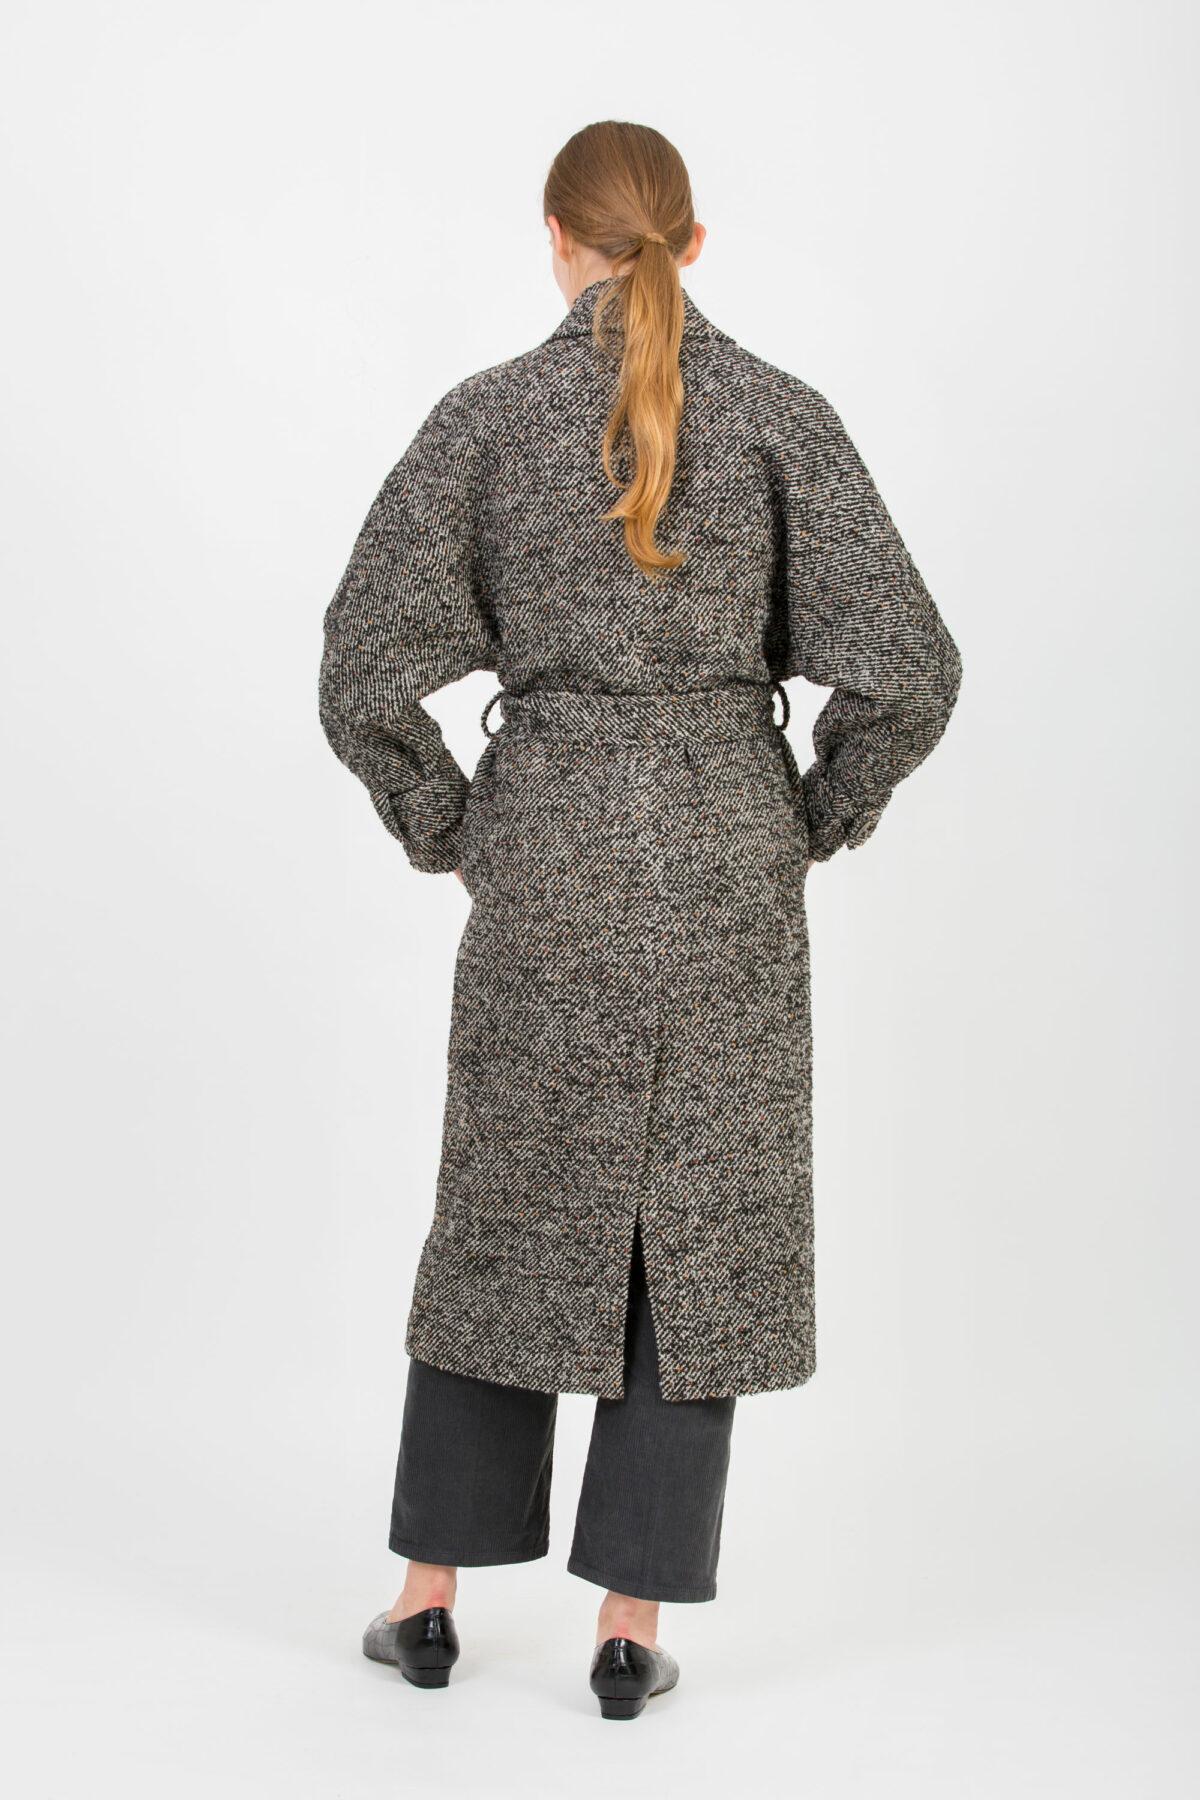 magistral-diagonal-herringbone-wool-coat-lapetite-francaise-matchboxathens